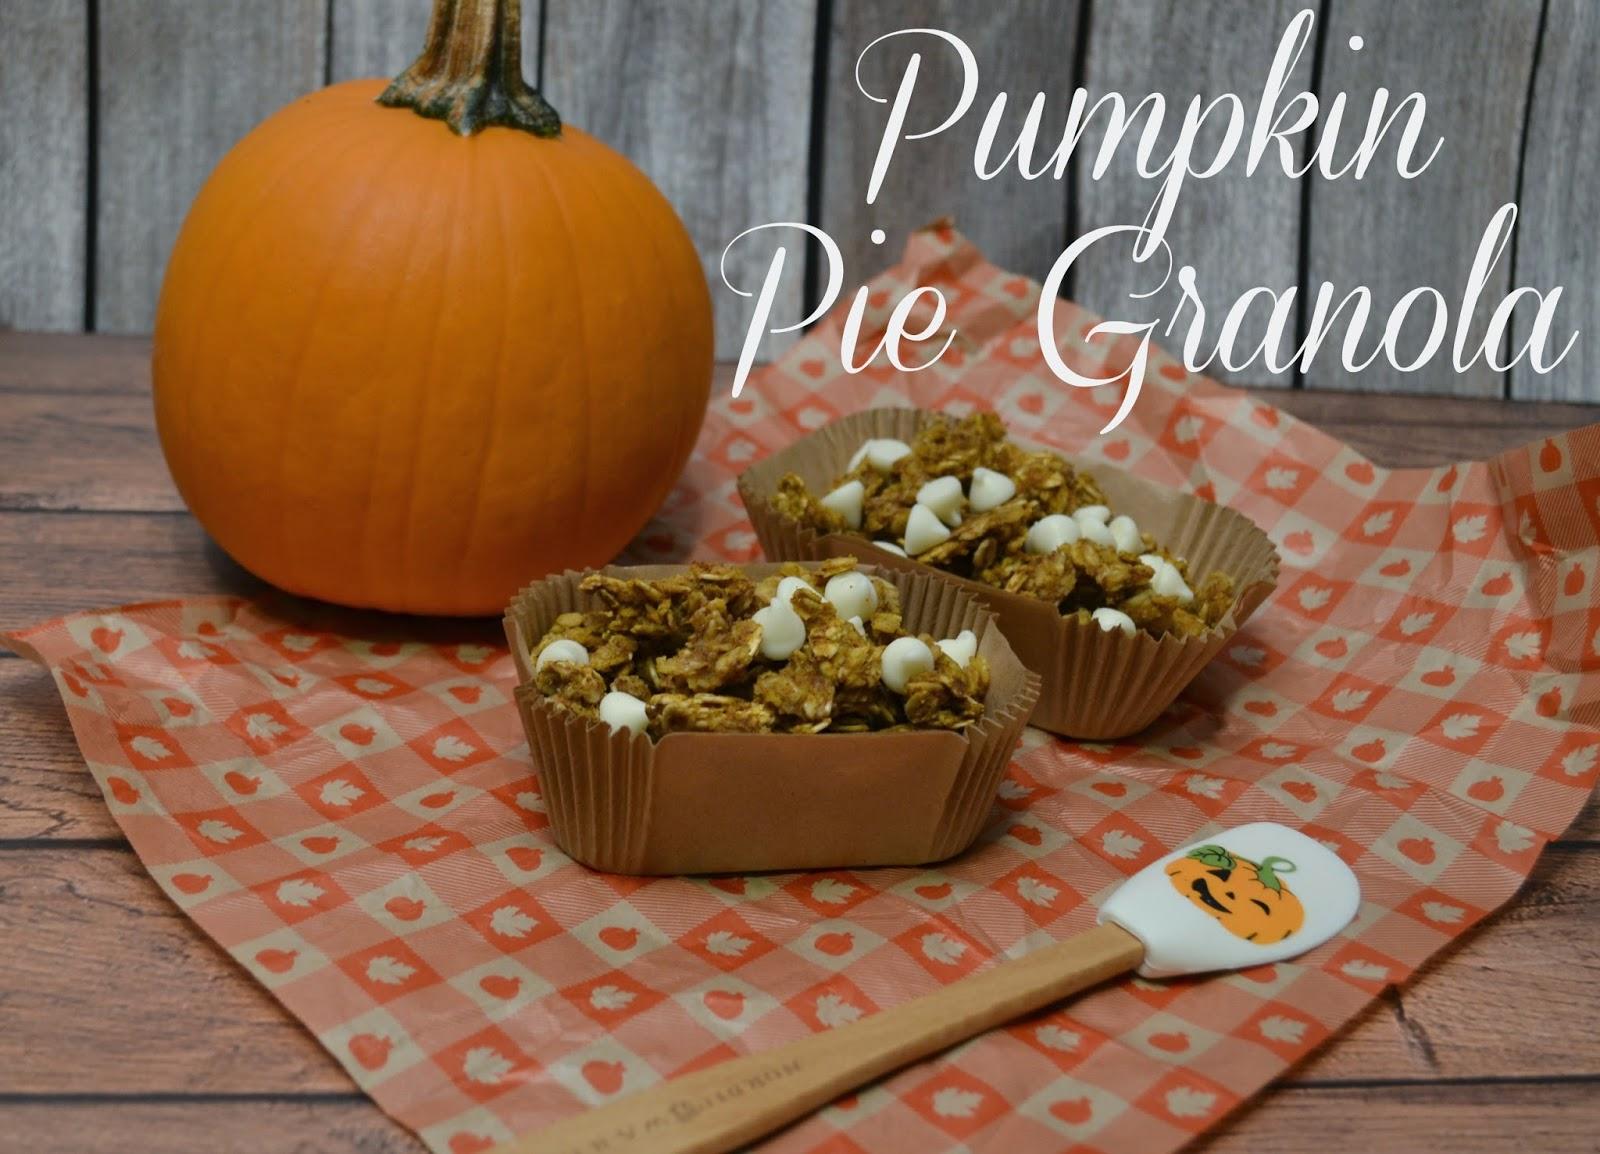 Pumpkin Pie Granola recipe.  Fall granola recipes.  Make your own granola.  Pumpkin Granola.  Granola recipe.  Nut free Granola recipe.